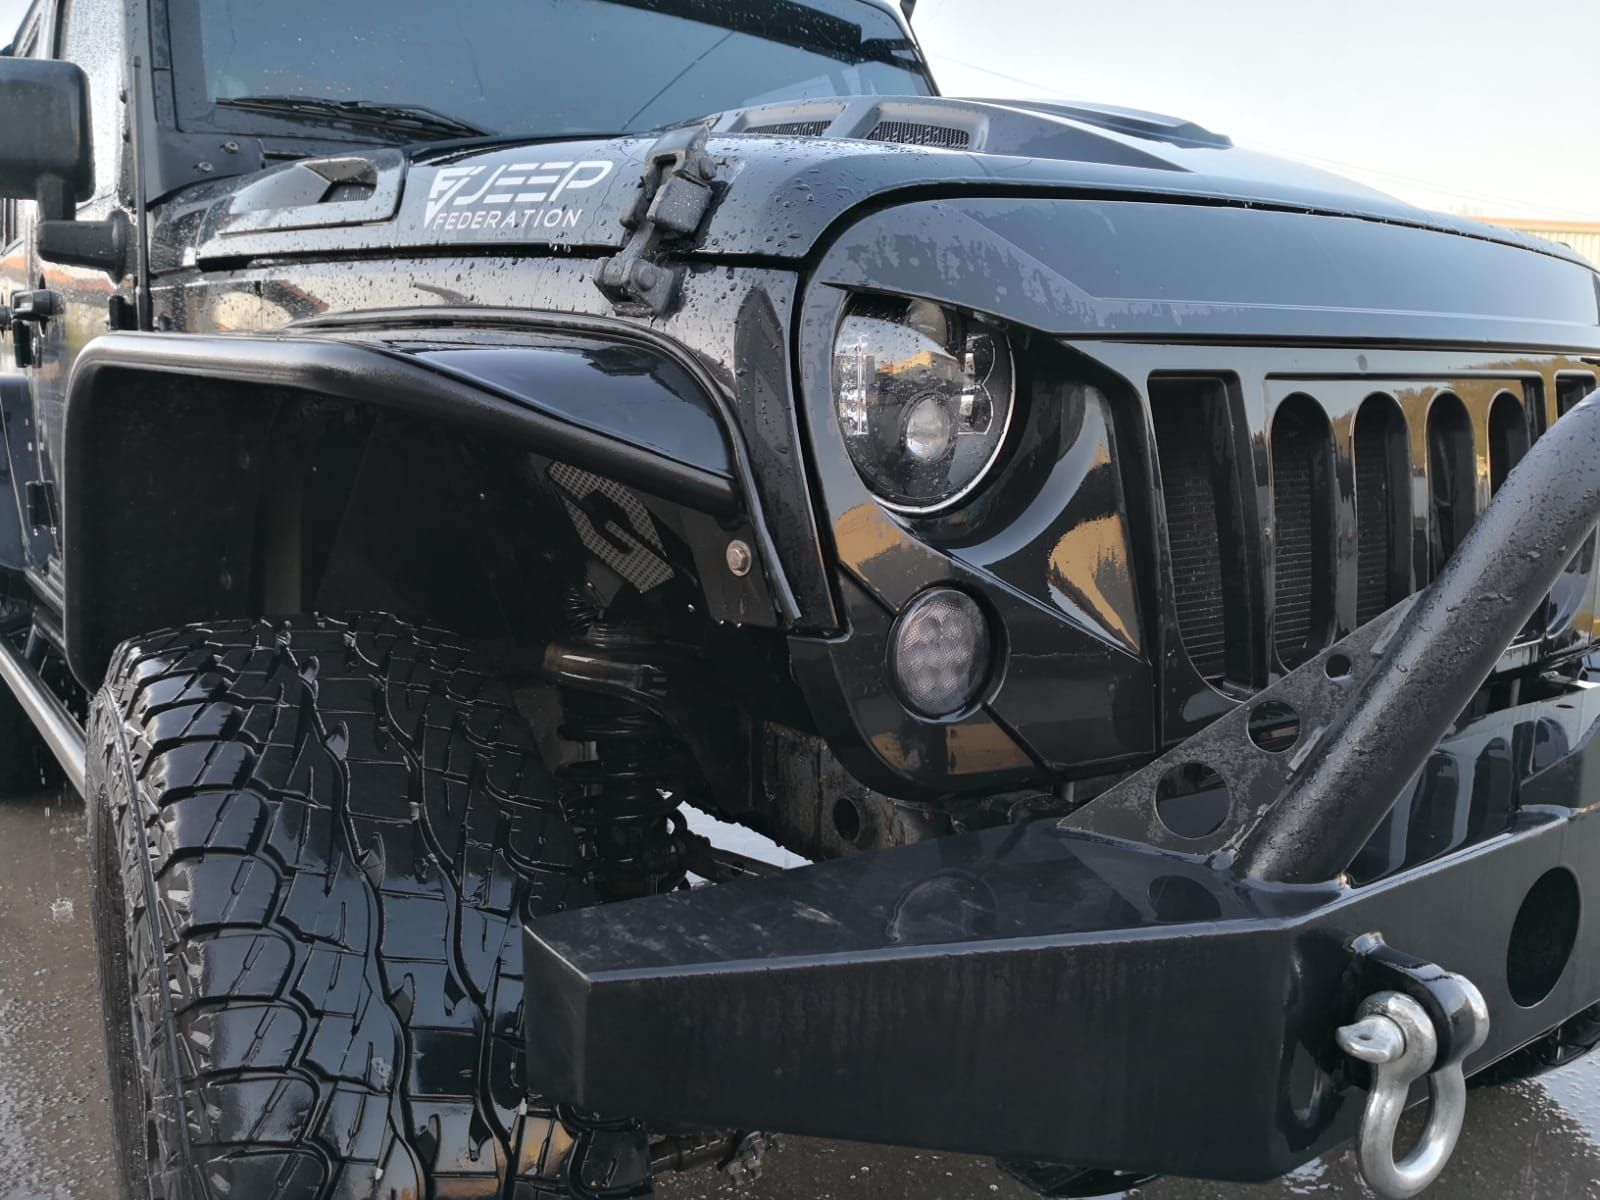 Aftermarket Jeep Jk Fenders